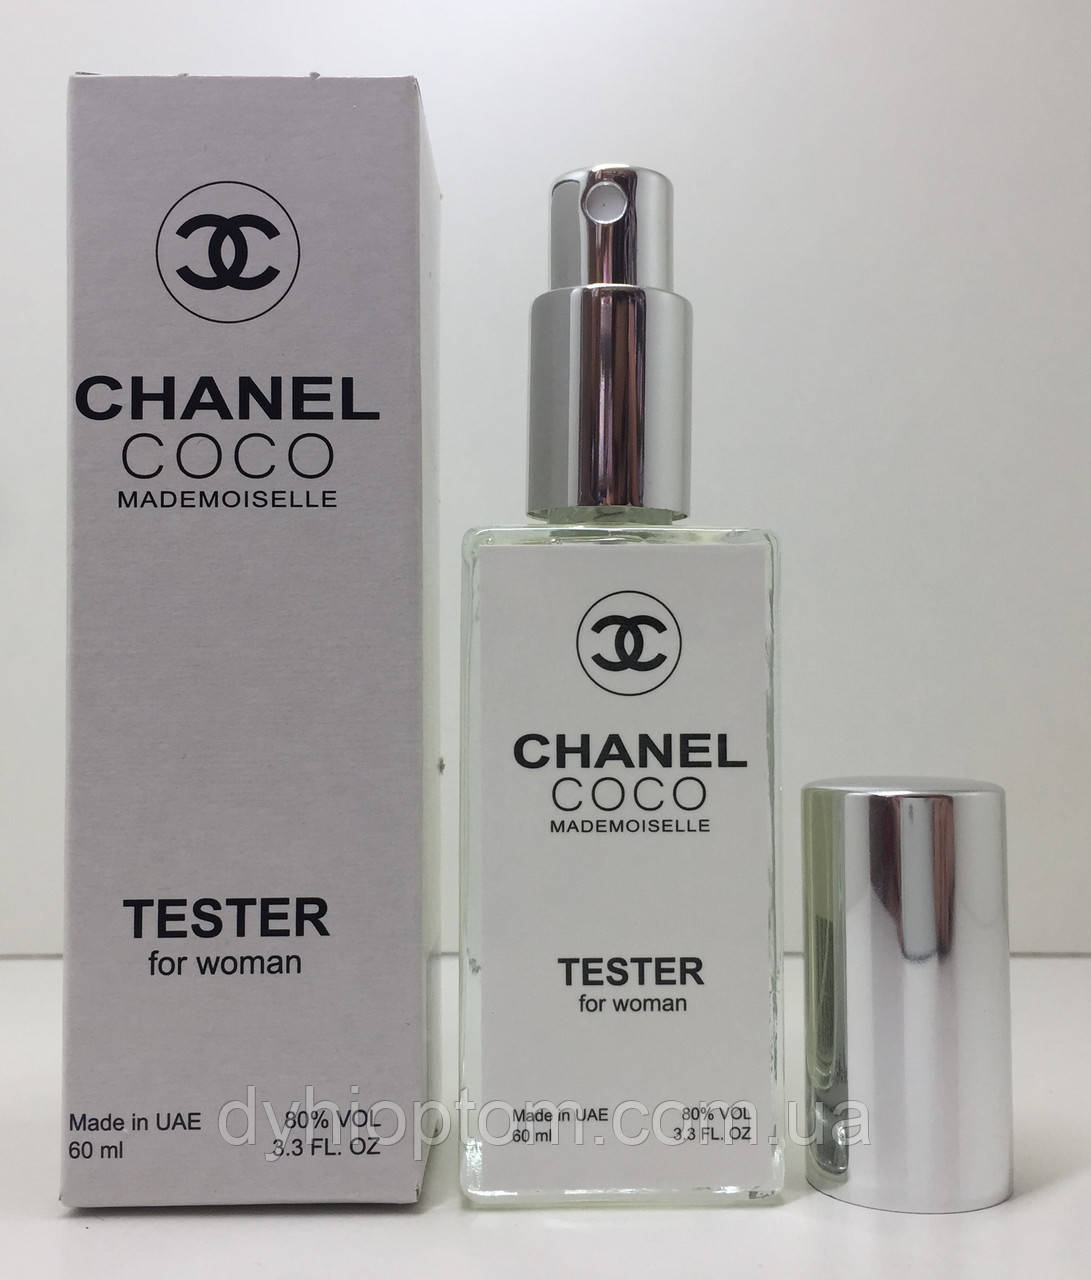 Тестер женский Chanel Coco Mademoiselle (Шанель Коко Мадмуазель) 60 мл